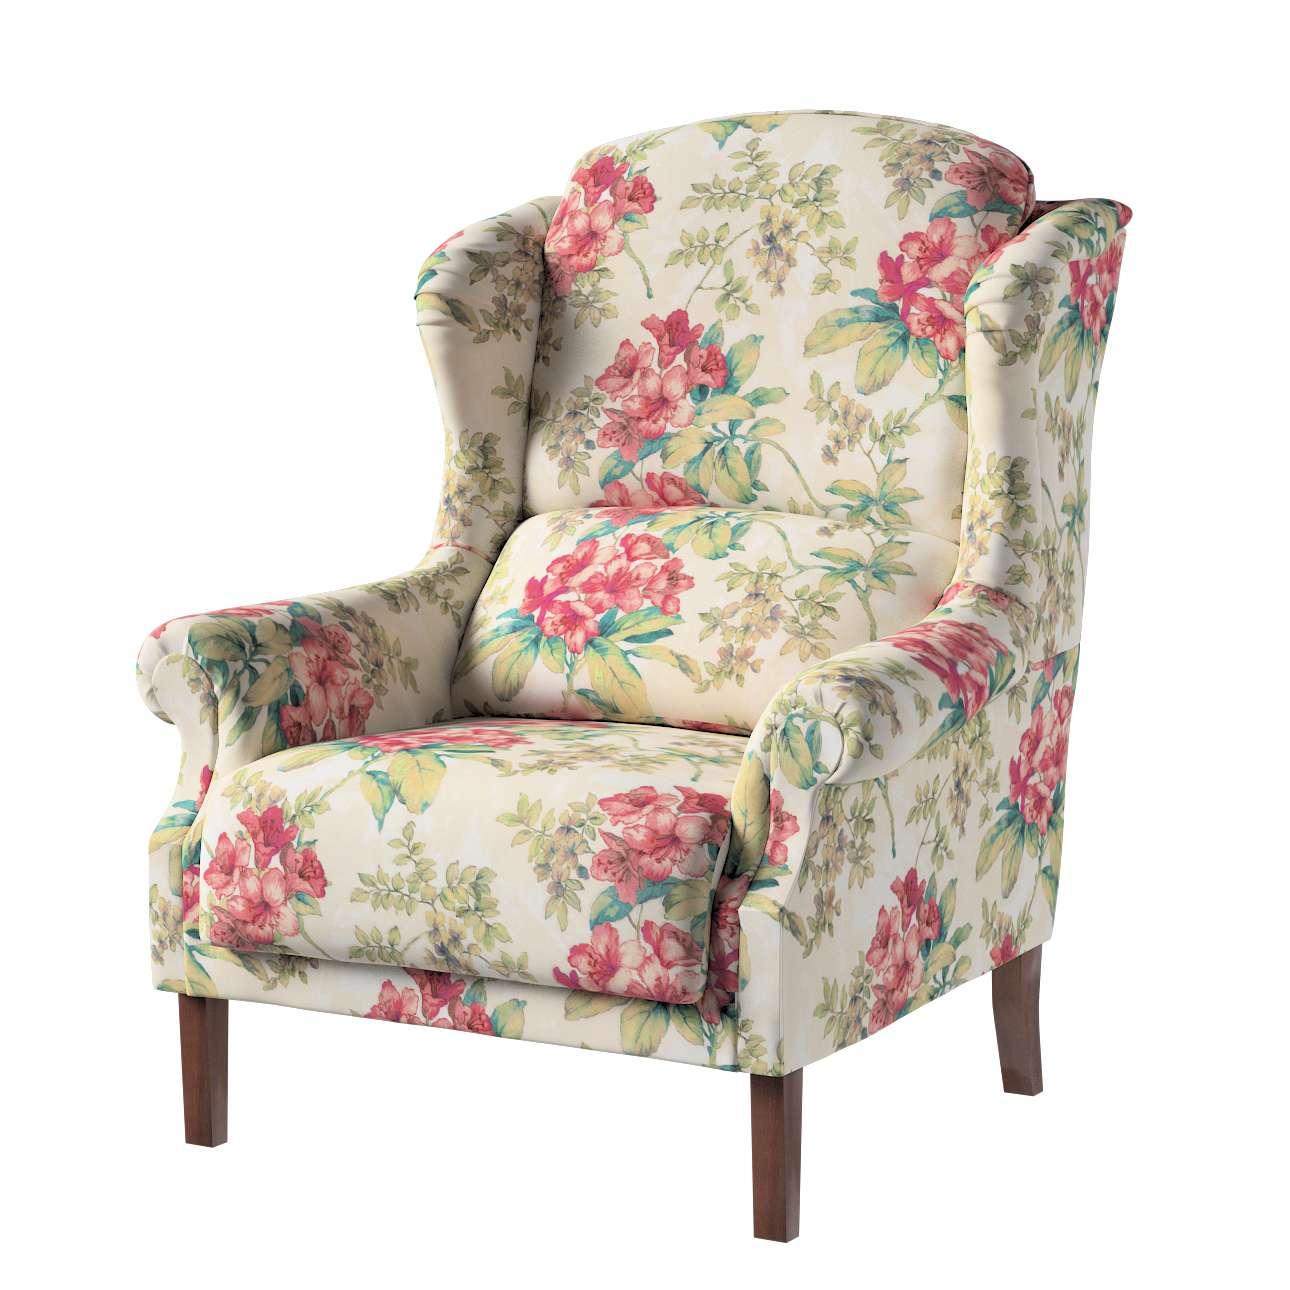 Fotel Unique w kolekcji Londres, tkanina: 143-40